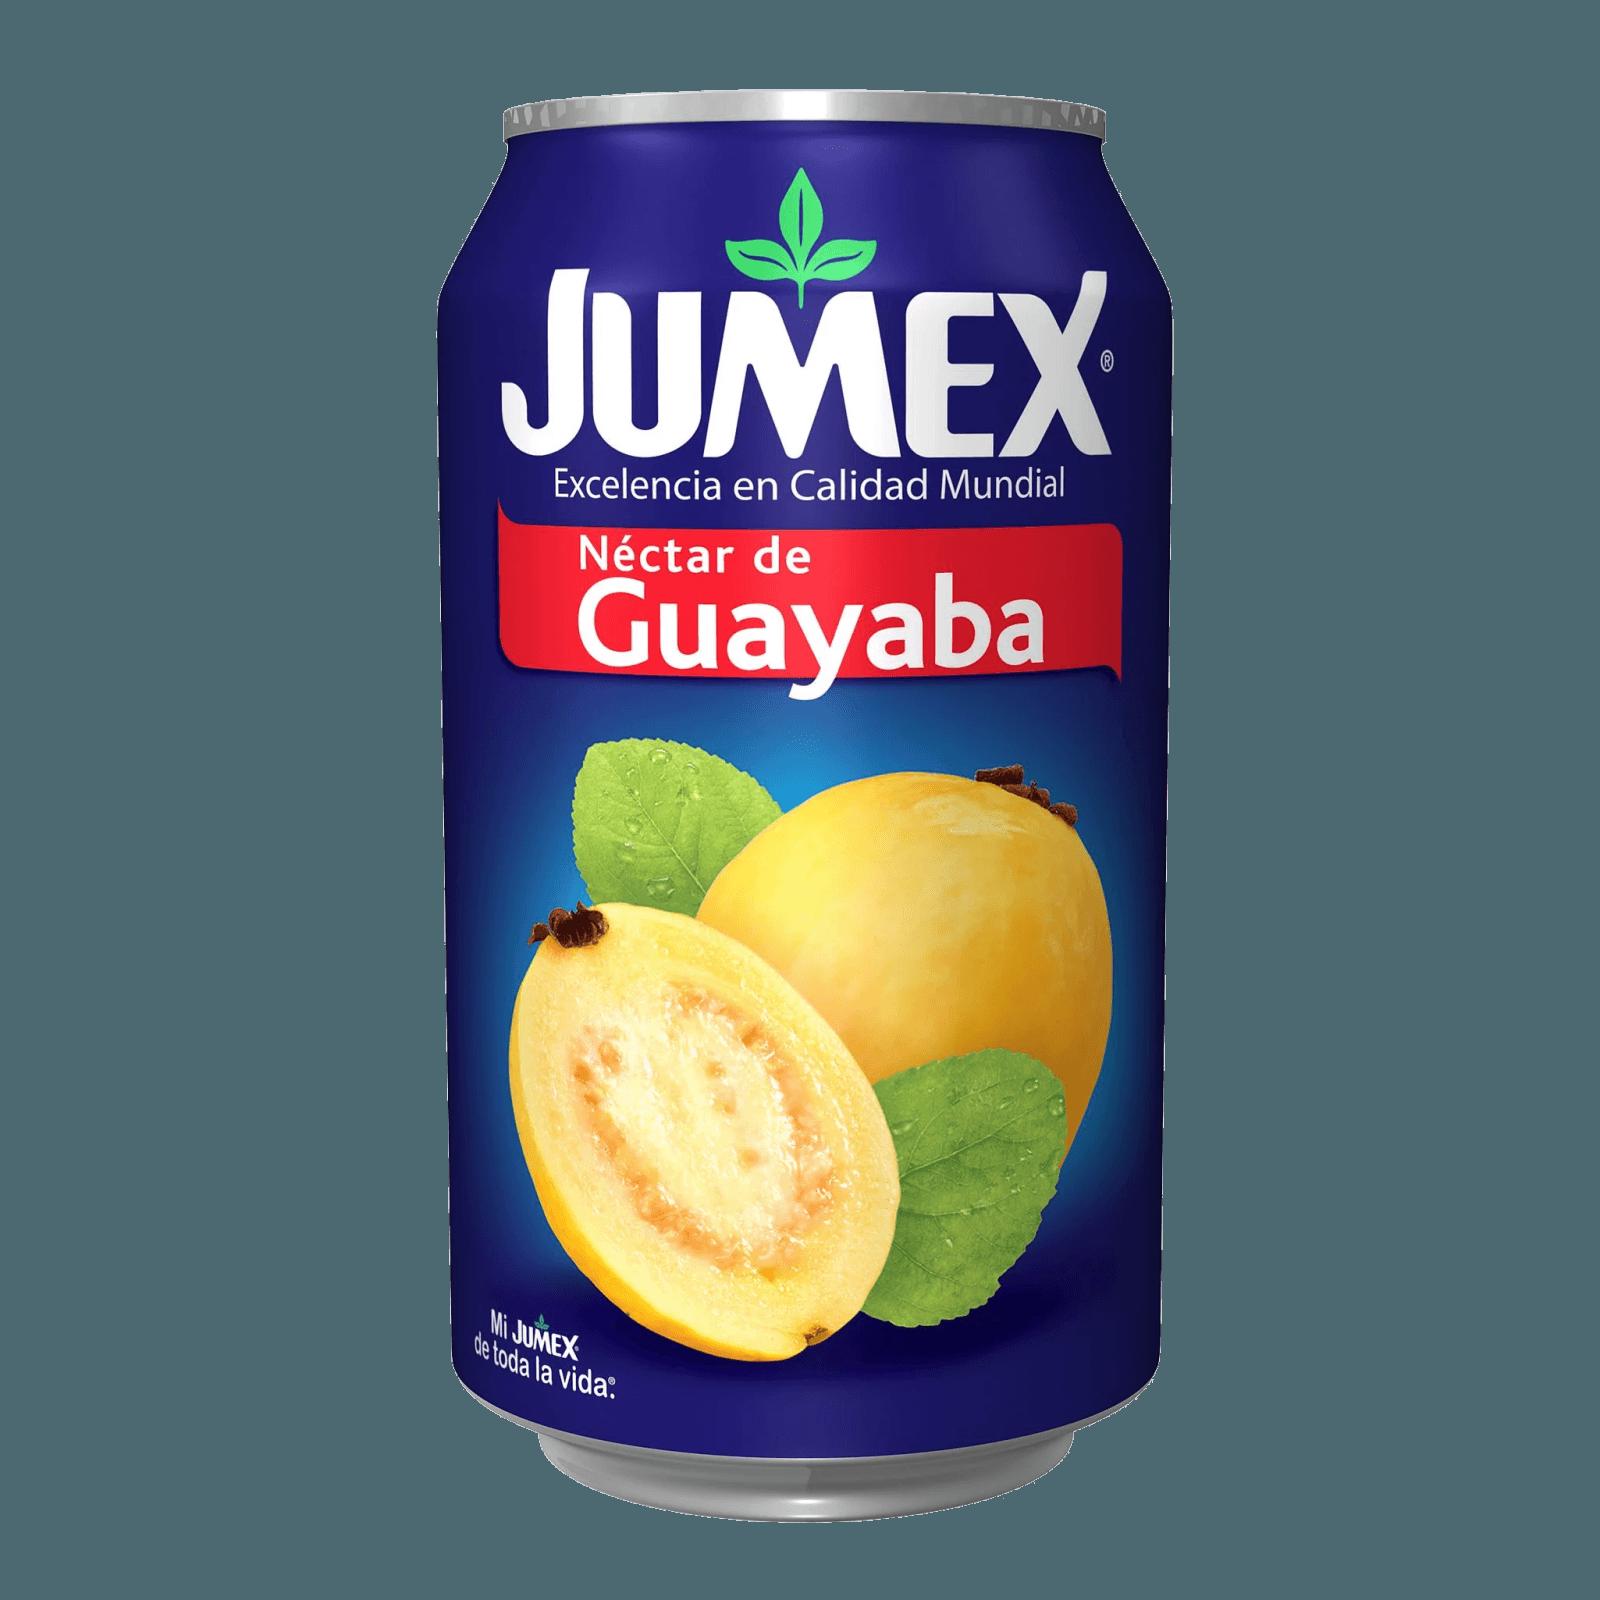 Нектар Jumex Guava Nectar (гуава), 0.335 л.